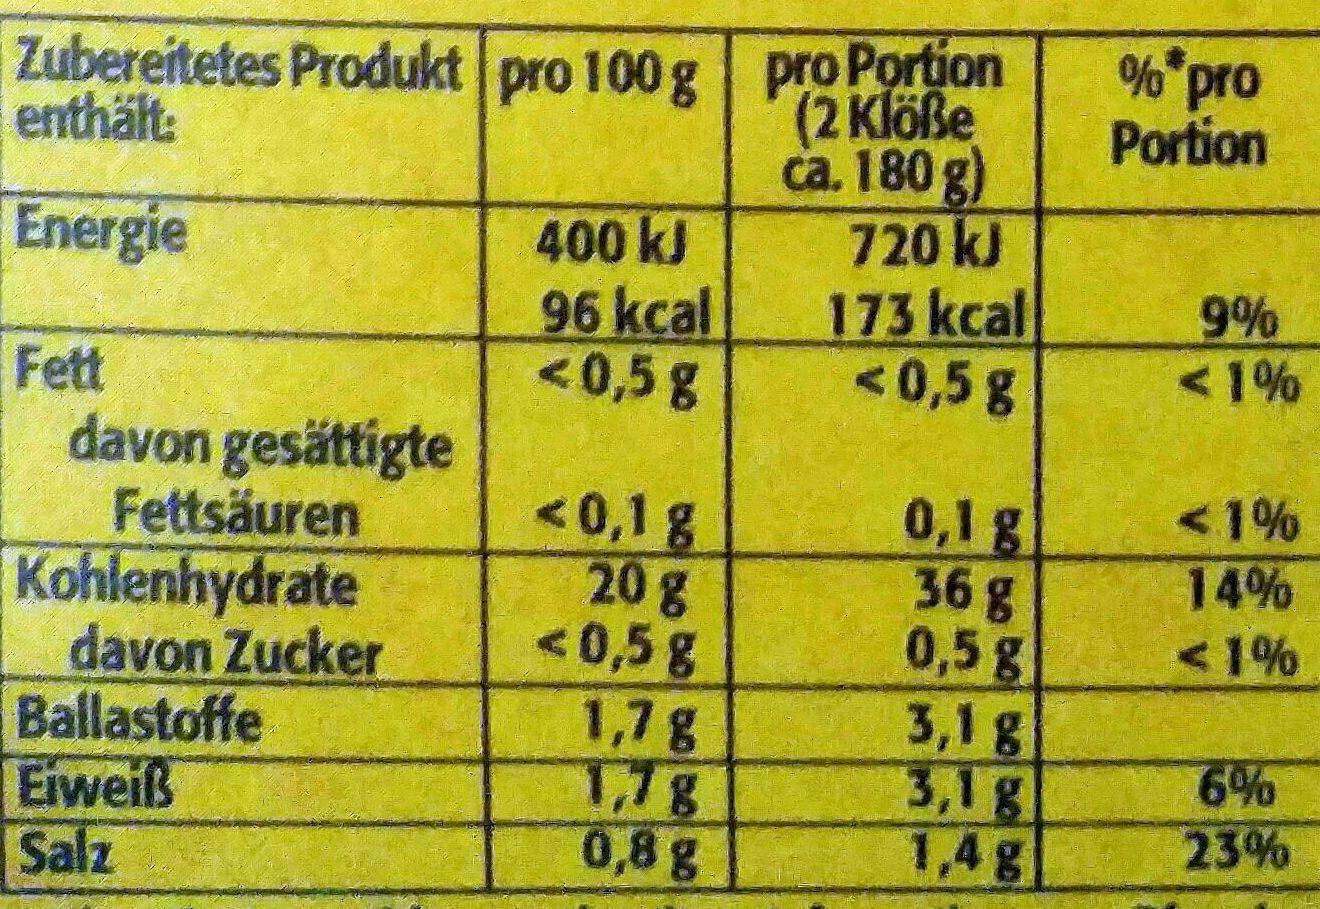 Pfanni Kartoffelteig 12 Knodel Halb & Halb (potato Dumpling Mix) - Informations nutritionnelles